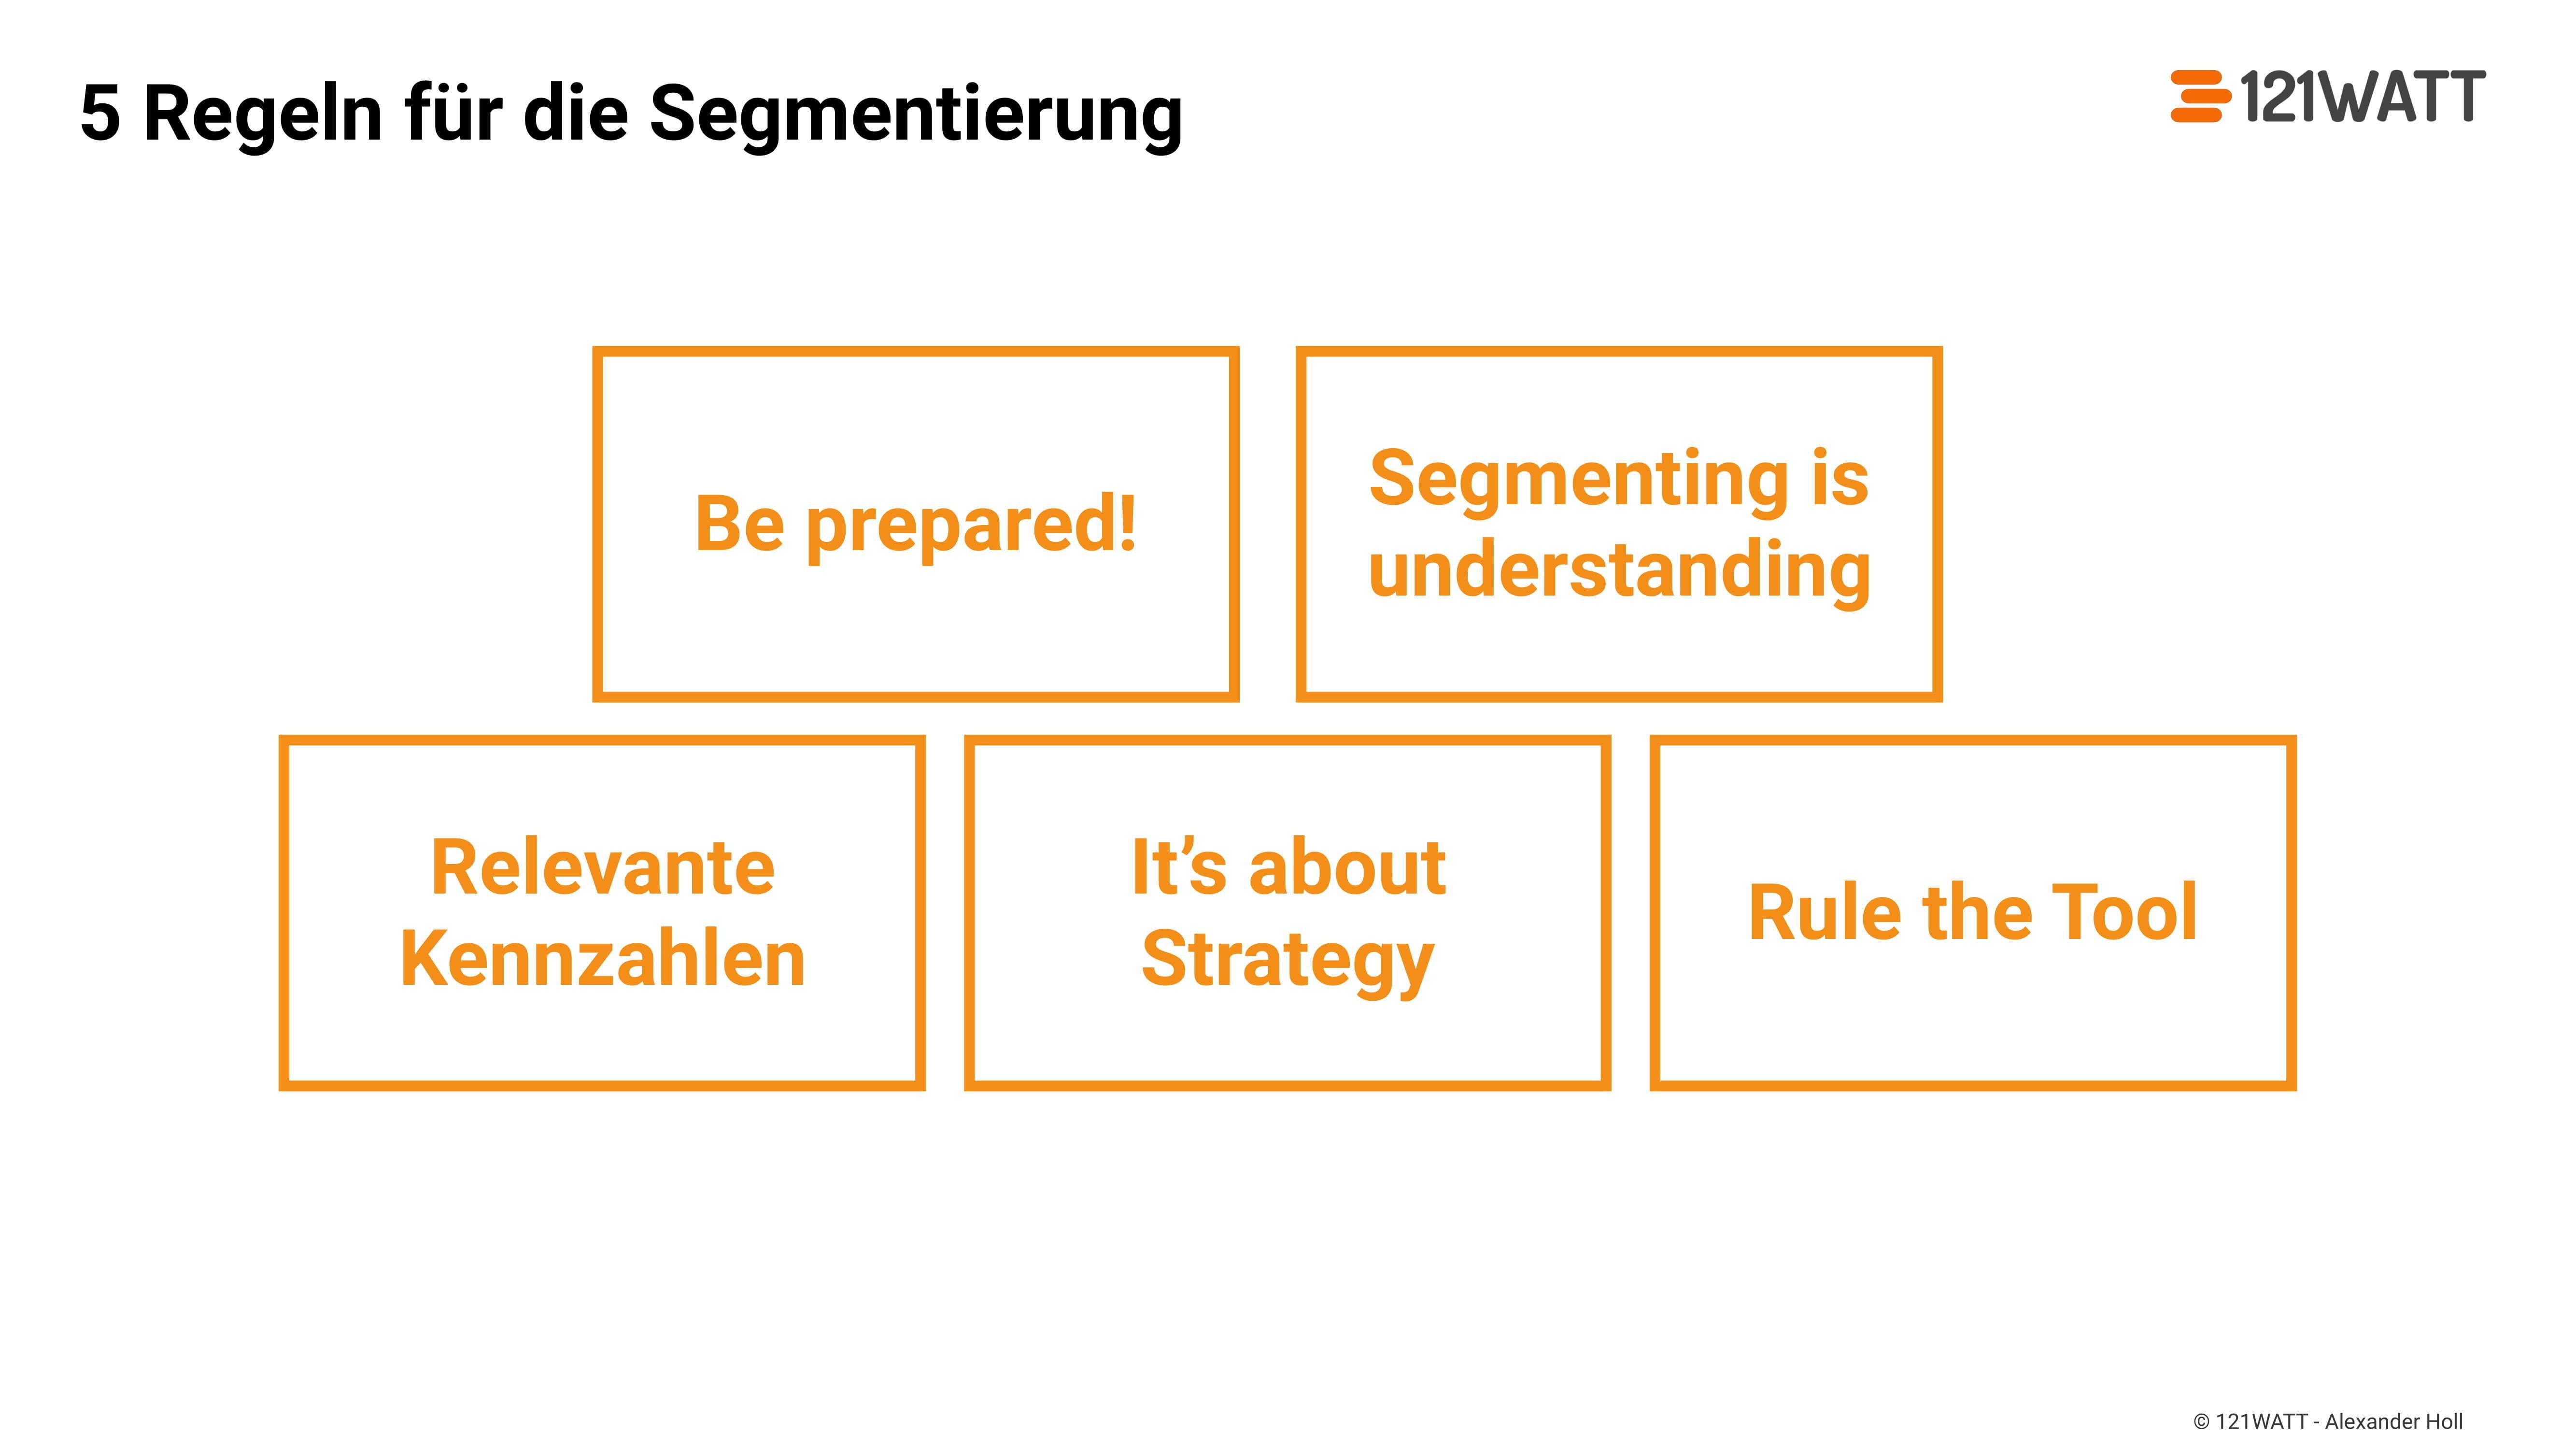 google-analytics-fortgeschrittene-segmentierungsstrategien-seo-day-short-version2-07.jpg